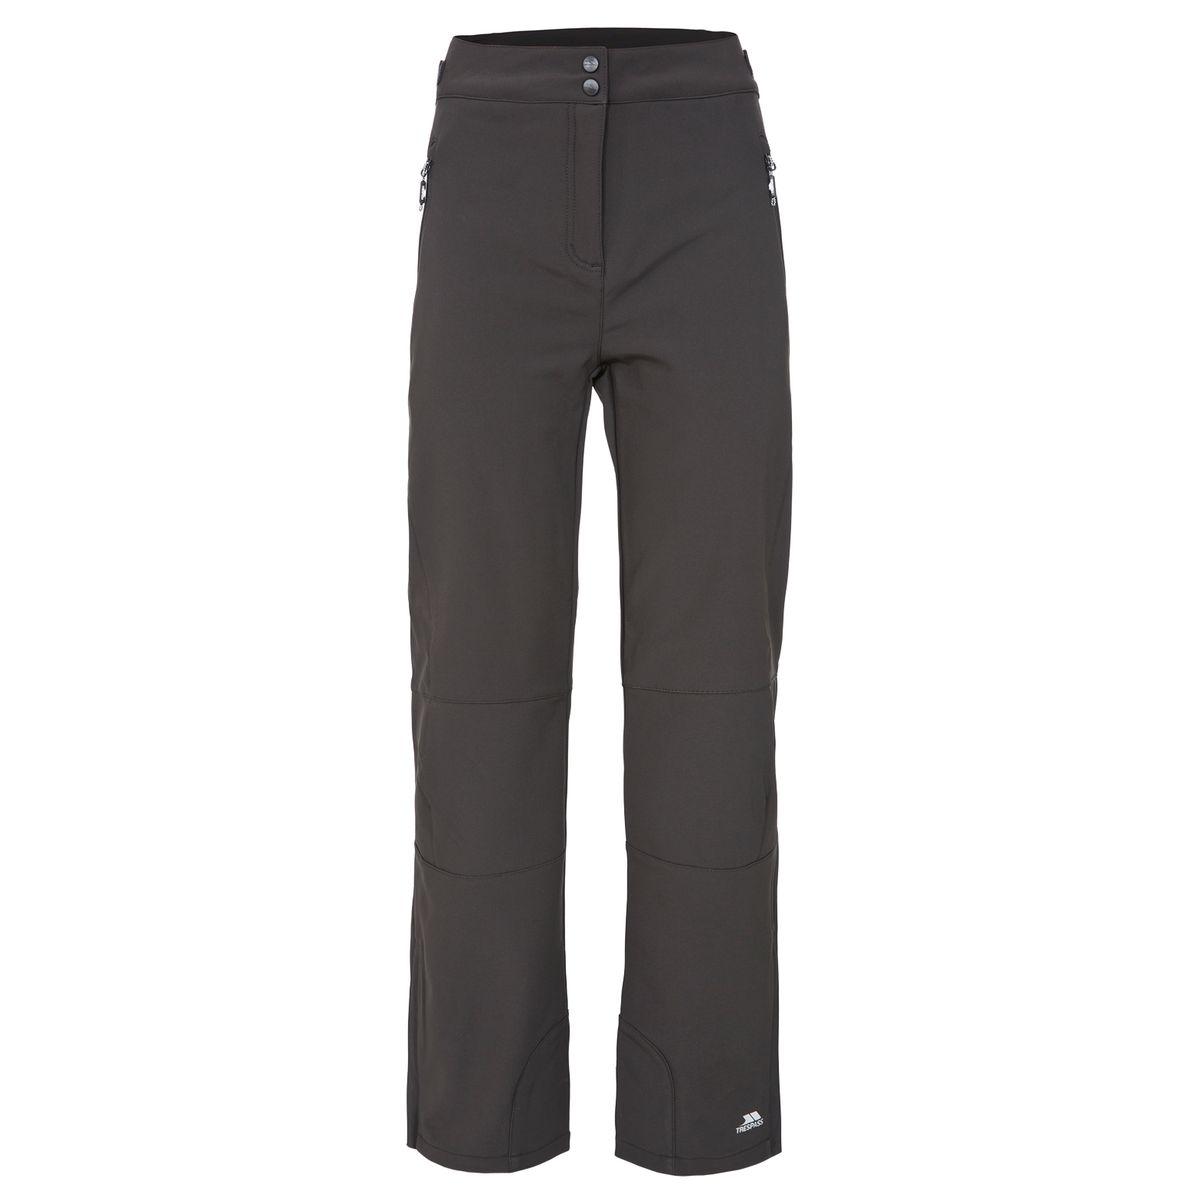 Squidge II pantalon softshell femme